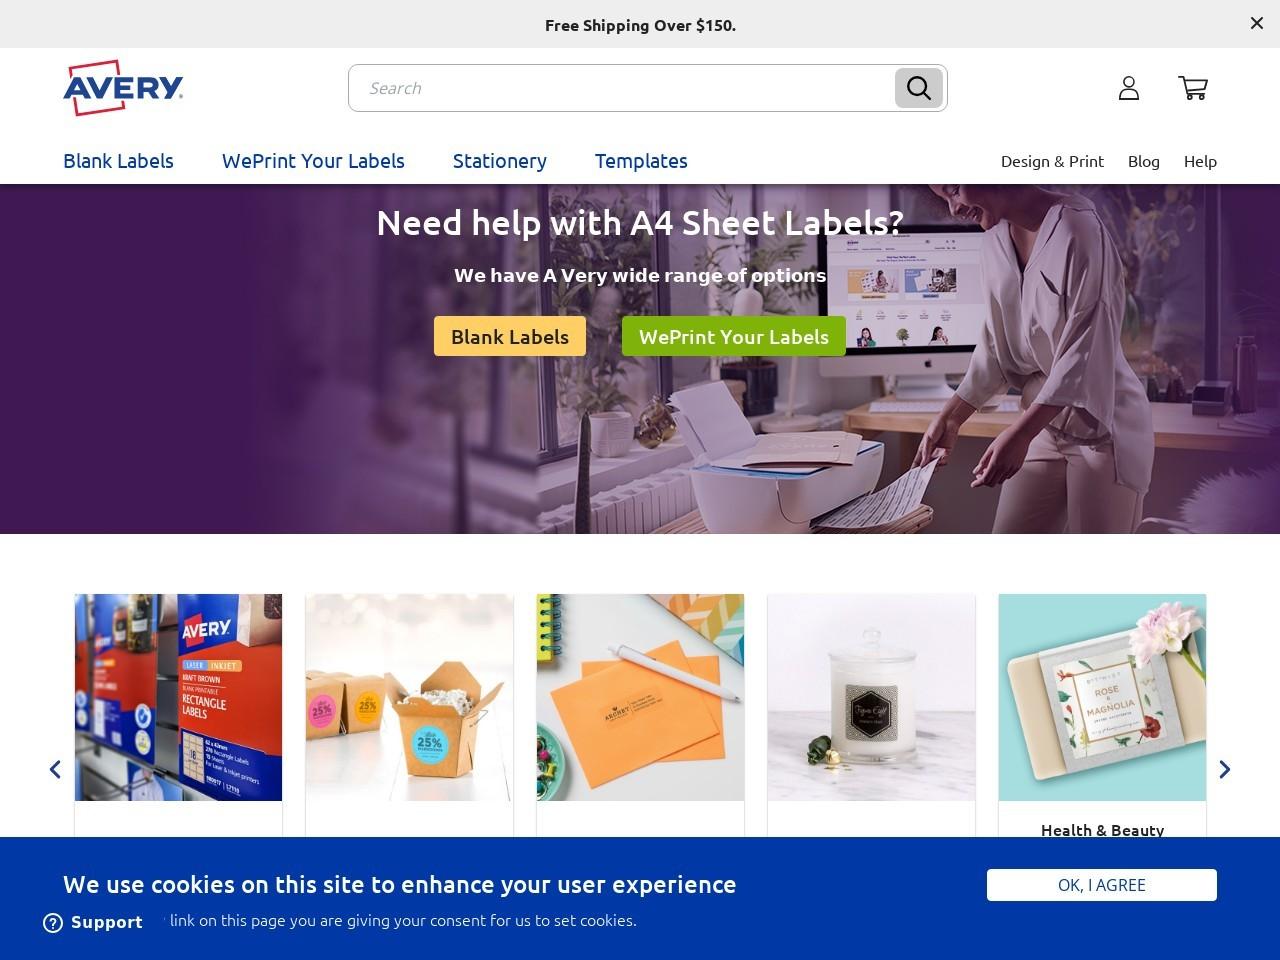 averyproducts.com.au